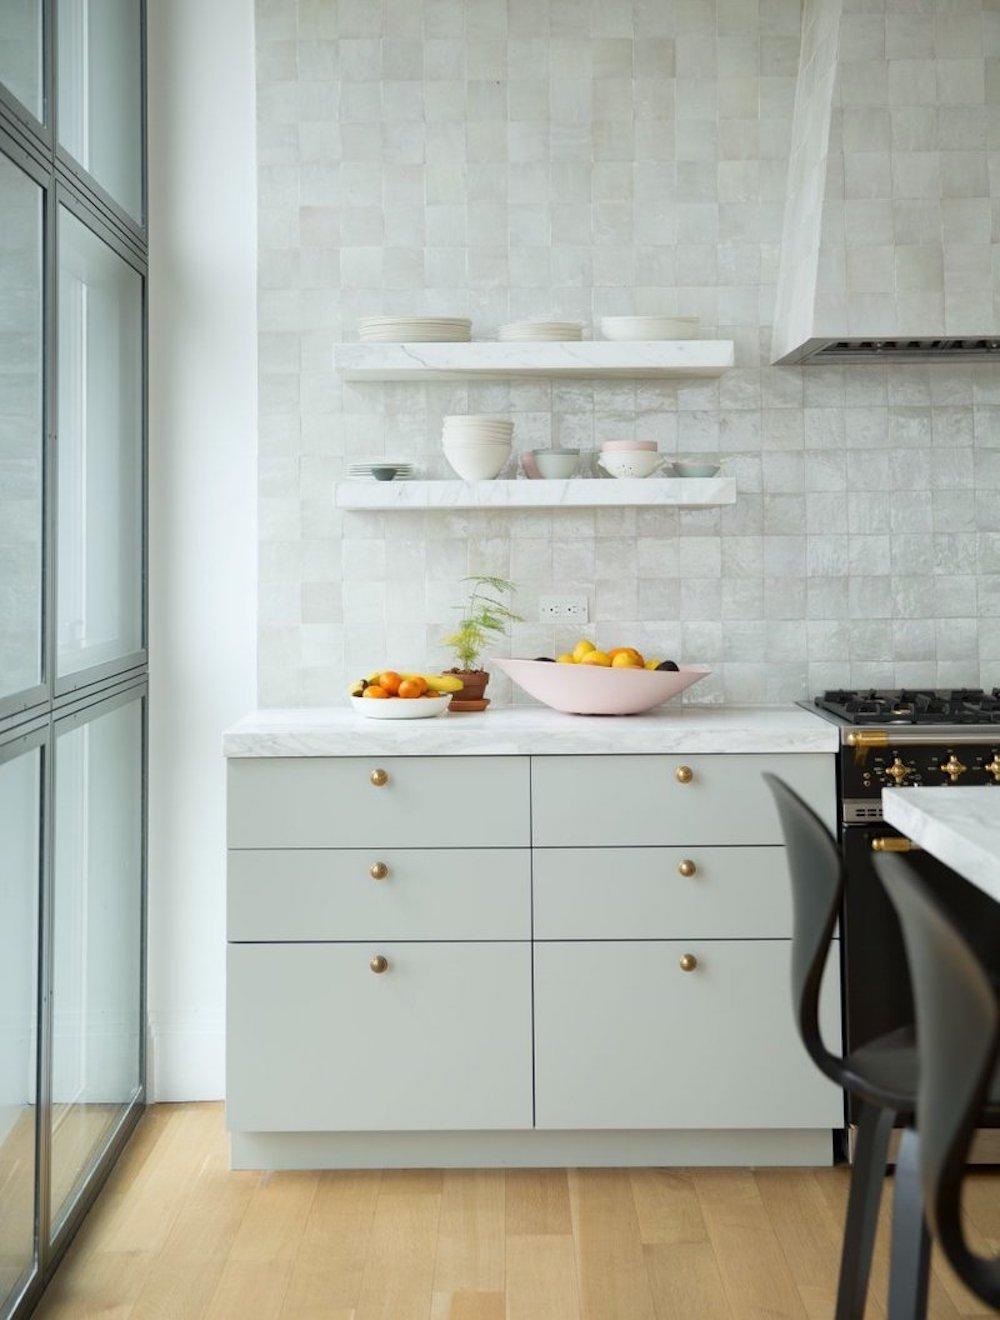 Zellige tile splashback || First Sense kitchen renovation inspiration